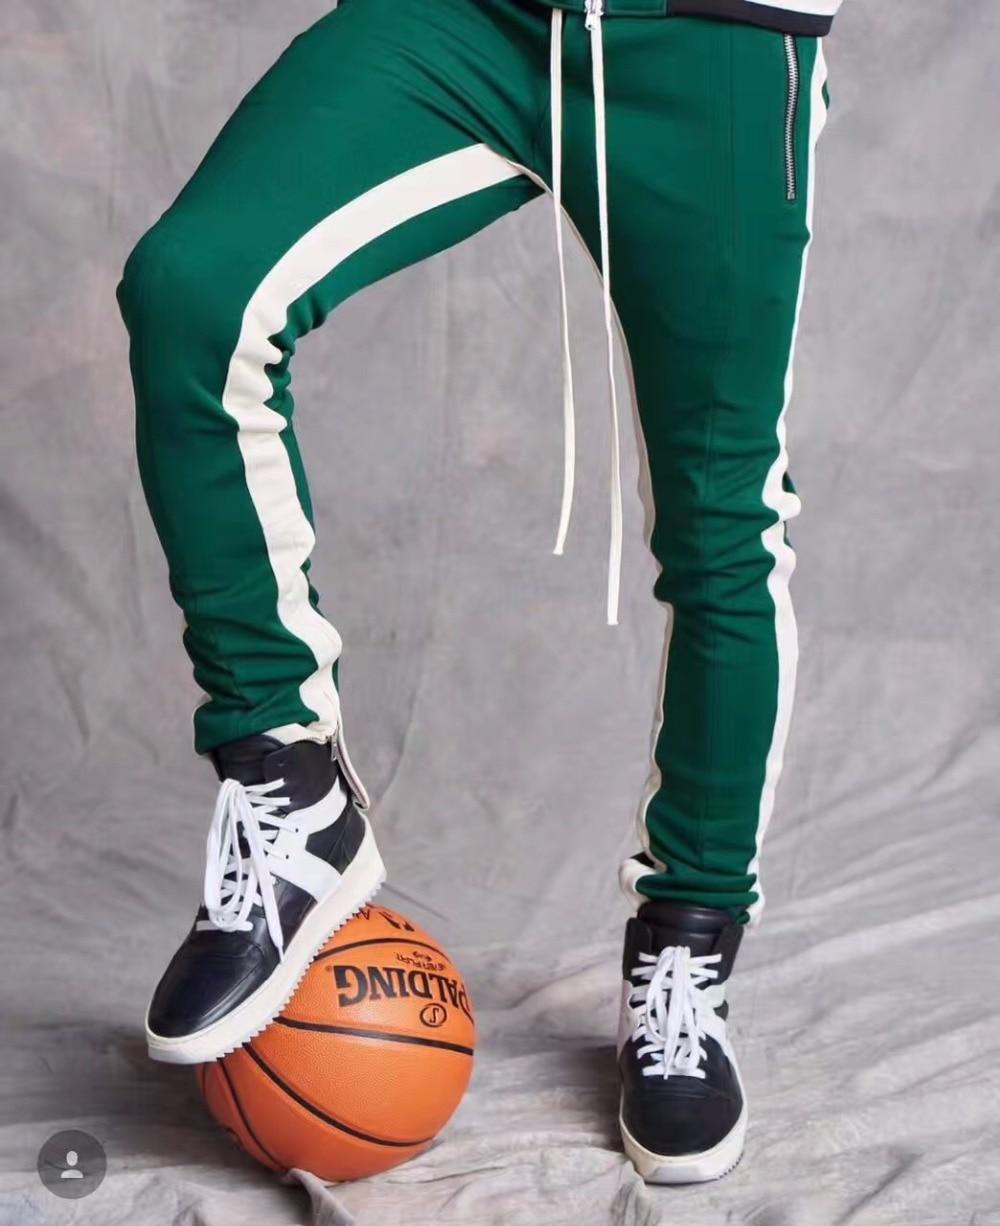 545647c363268e Vintage Double Striped Track Pants 2017 Slim Fit Zipper Ankle&Pockets  Joggers Contrast Waistline Free Shipping